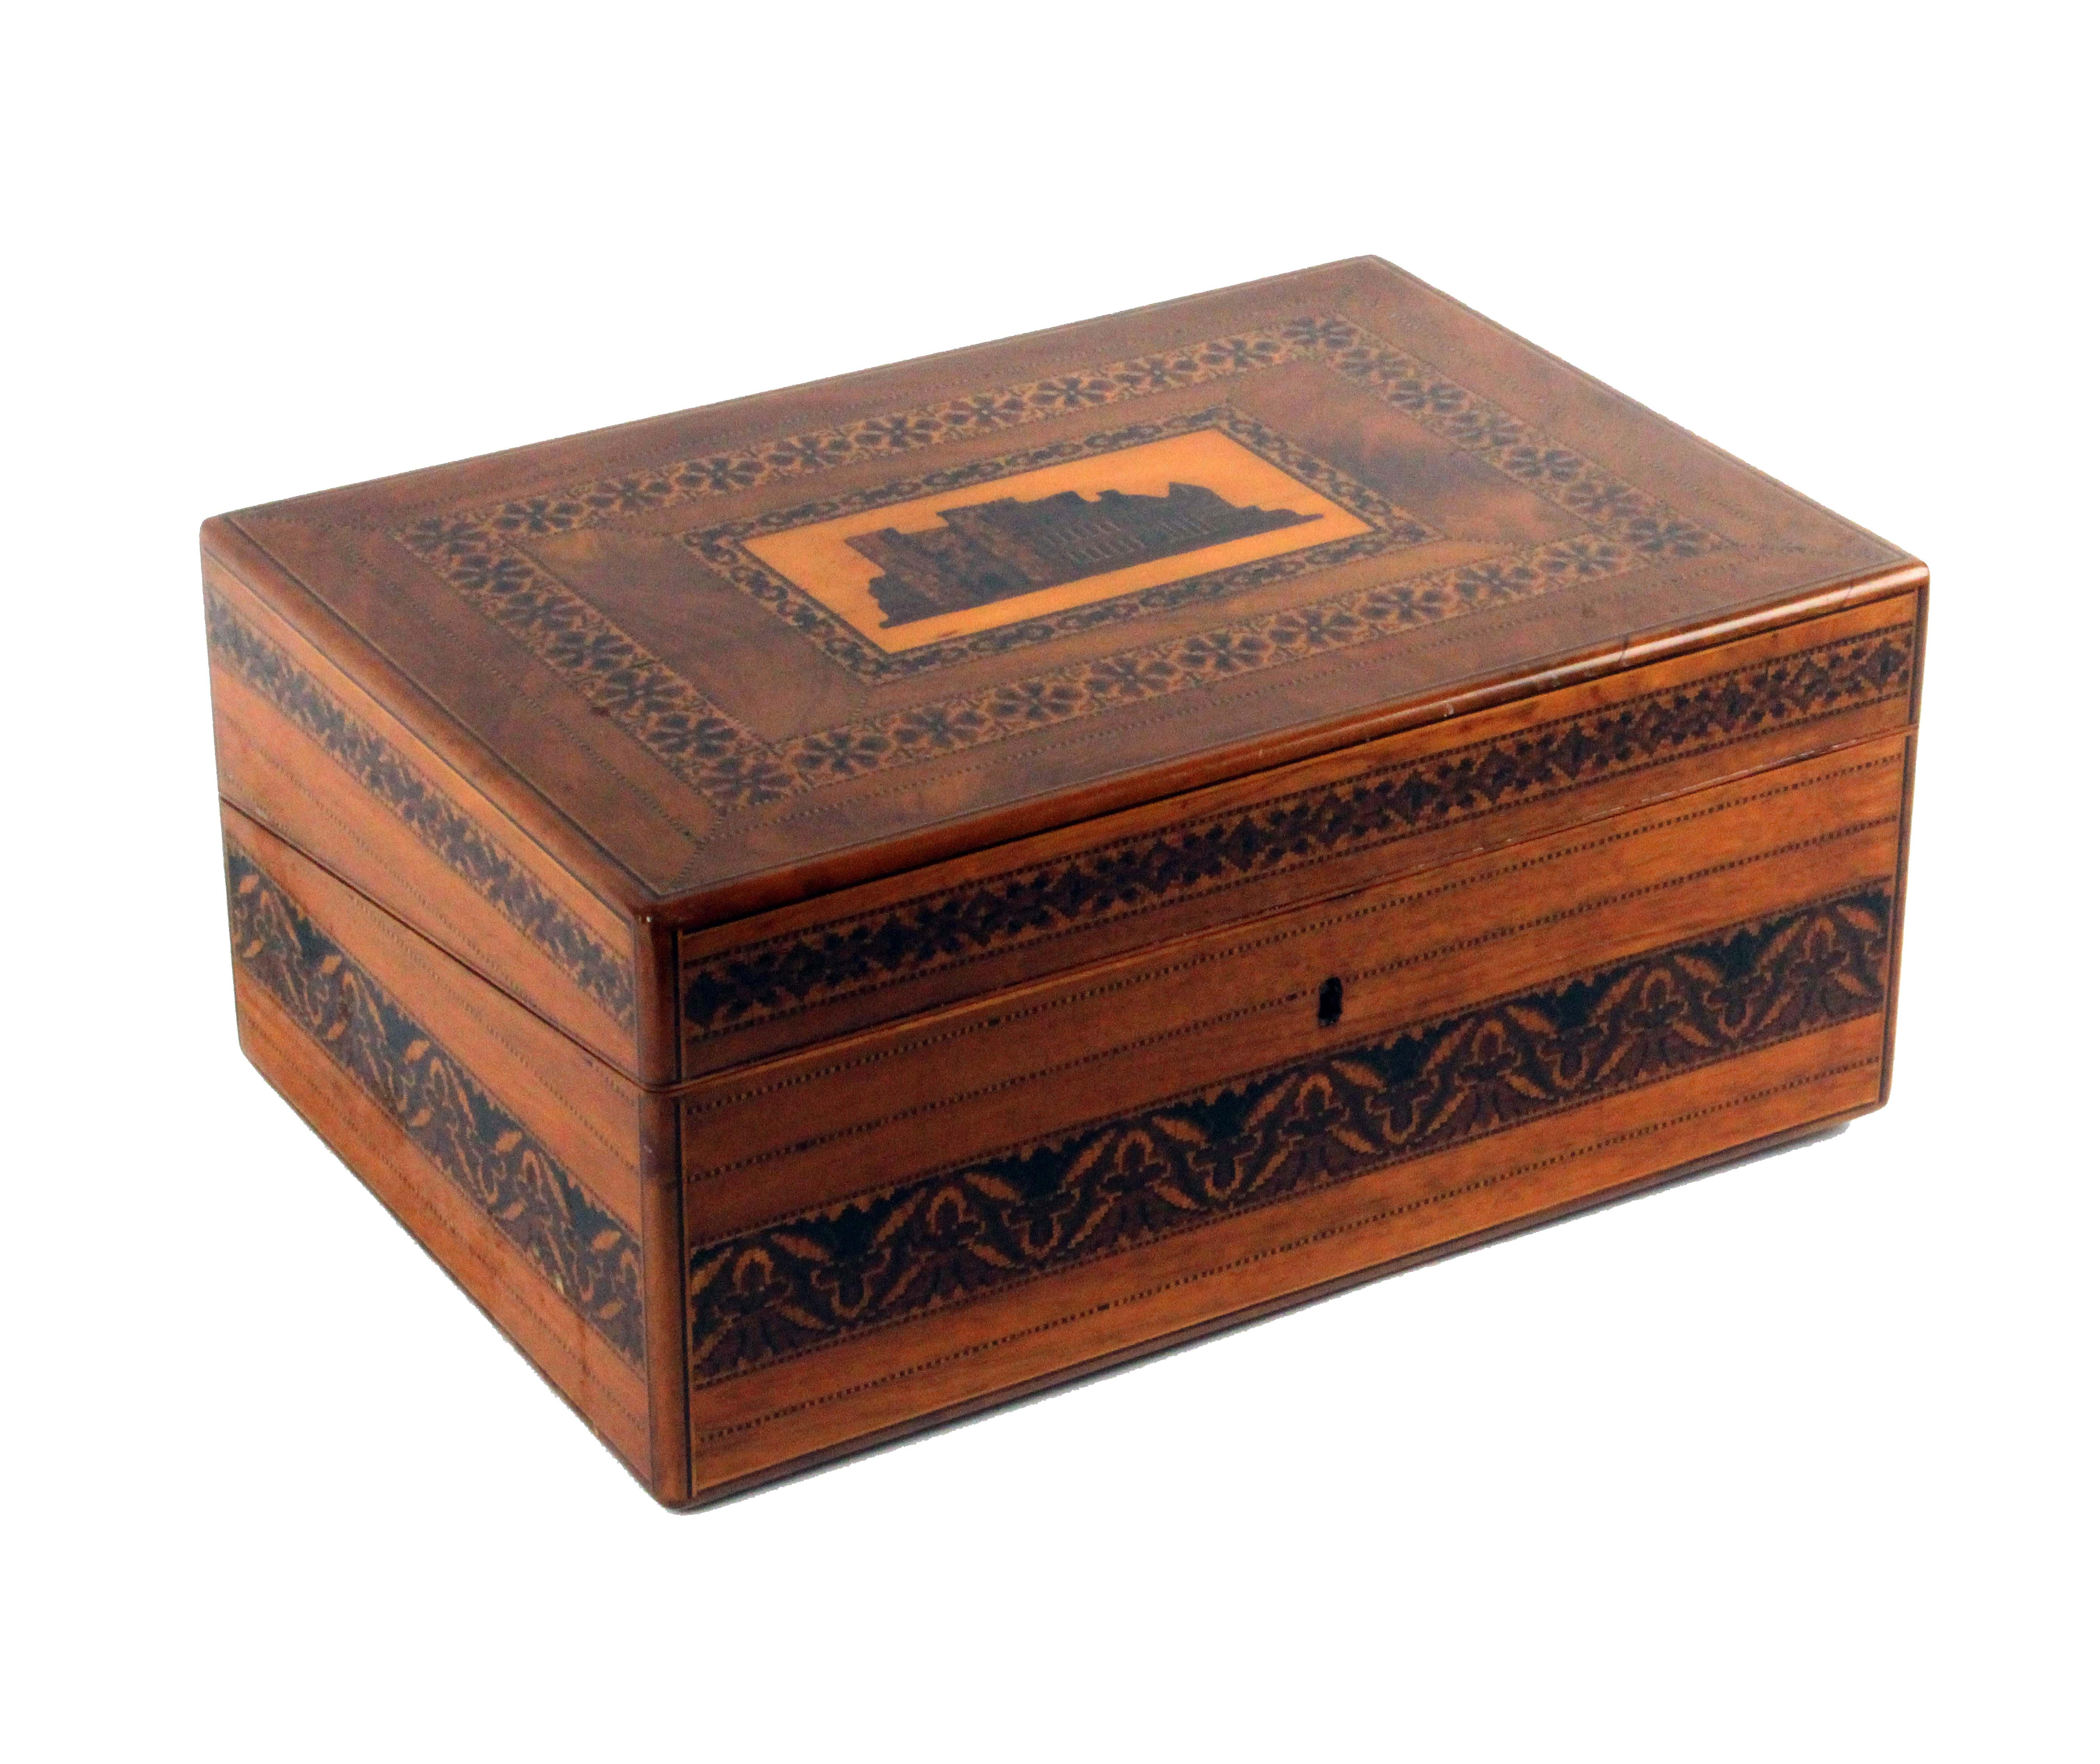 A rare Tunbridge ware mahogany writing box, the lid with an inset mosaic panel of Tunbridge Castle